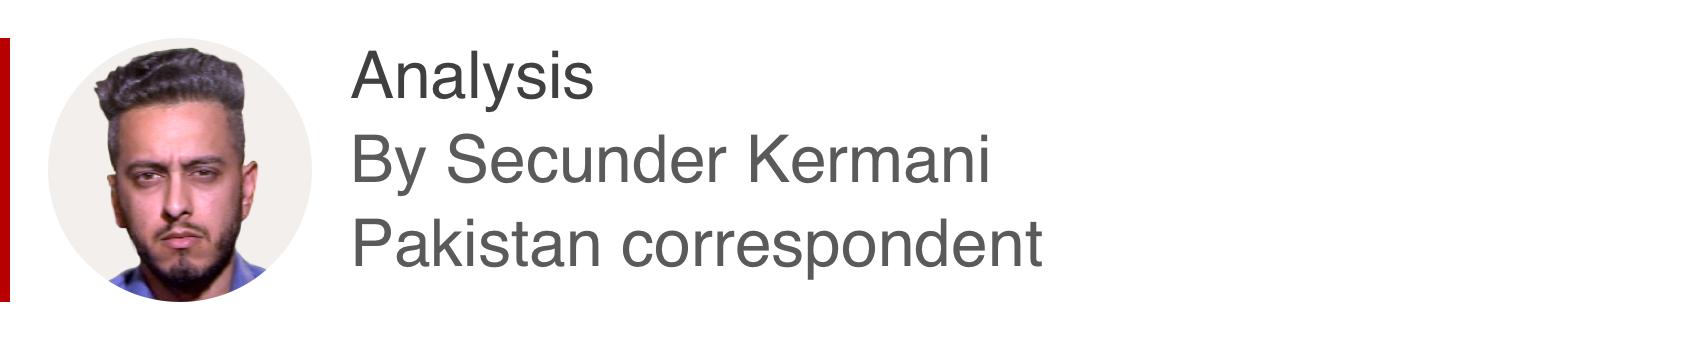 Analysis box by Secunder Kermani, Pakistan correspondent